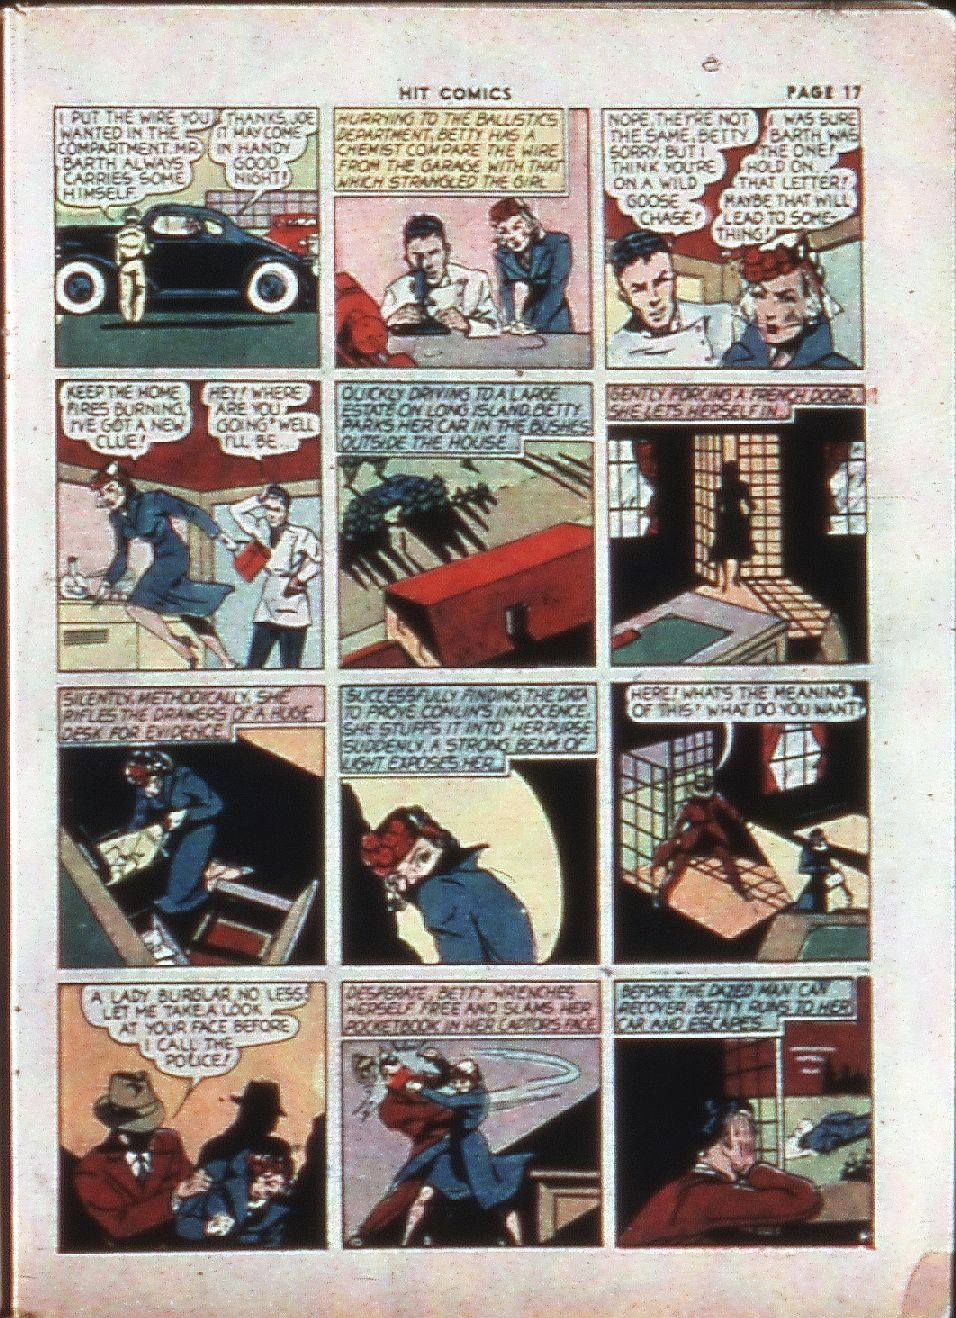 Read online Hit Comics comic -  Issue #4 - 19